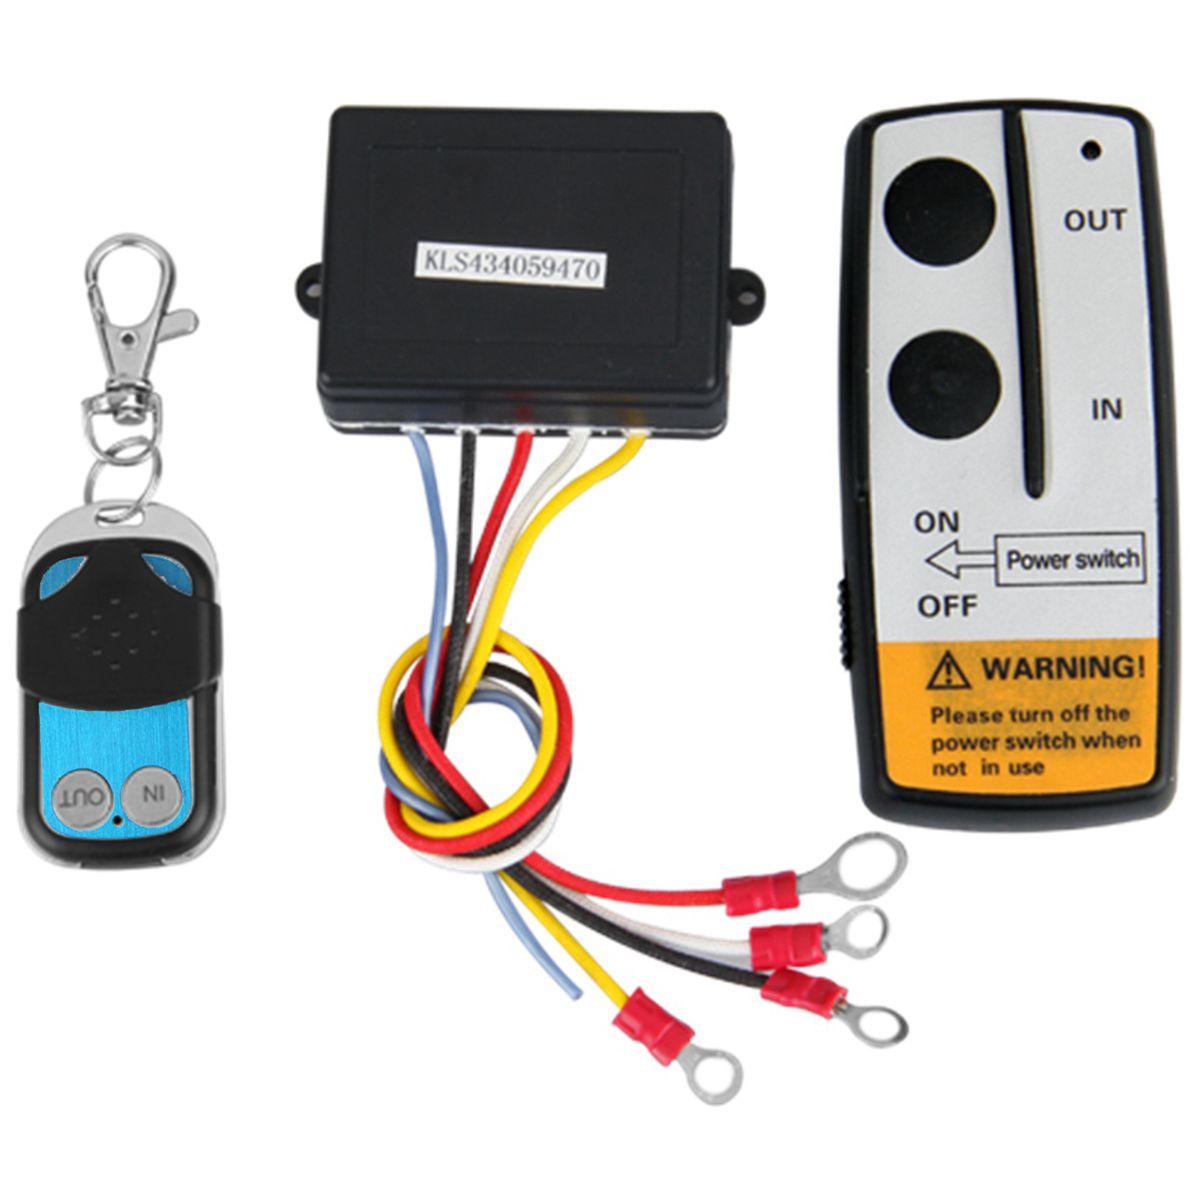 12V 12Volt 50ft Winch Wireless Remote Control Set for Truck Jeep ATV Warn Ramsey|Remote Controls| |  - title=